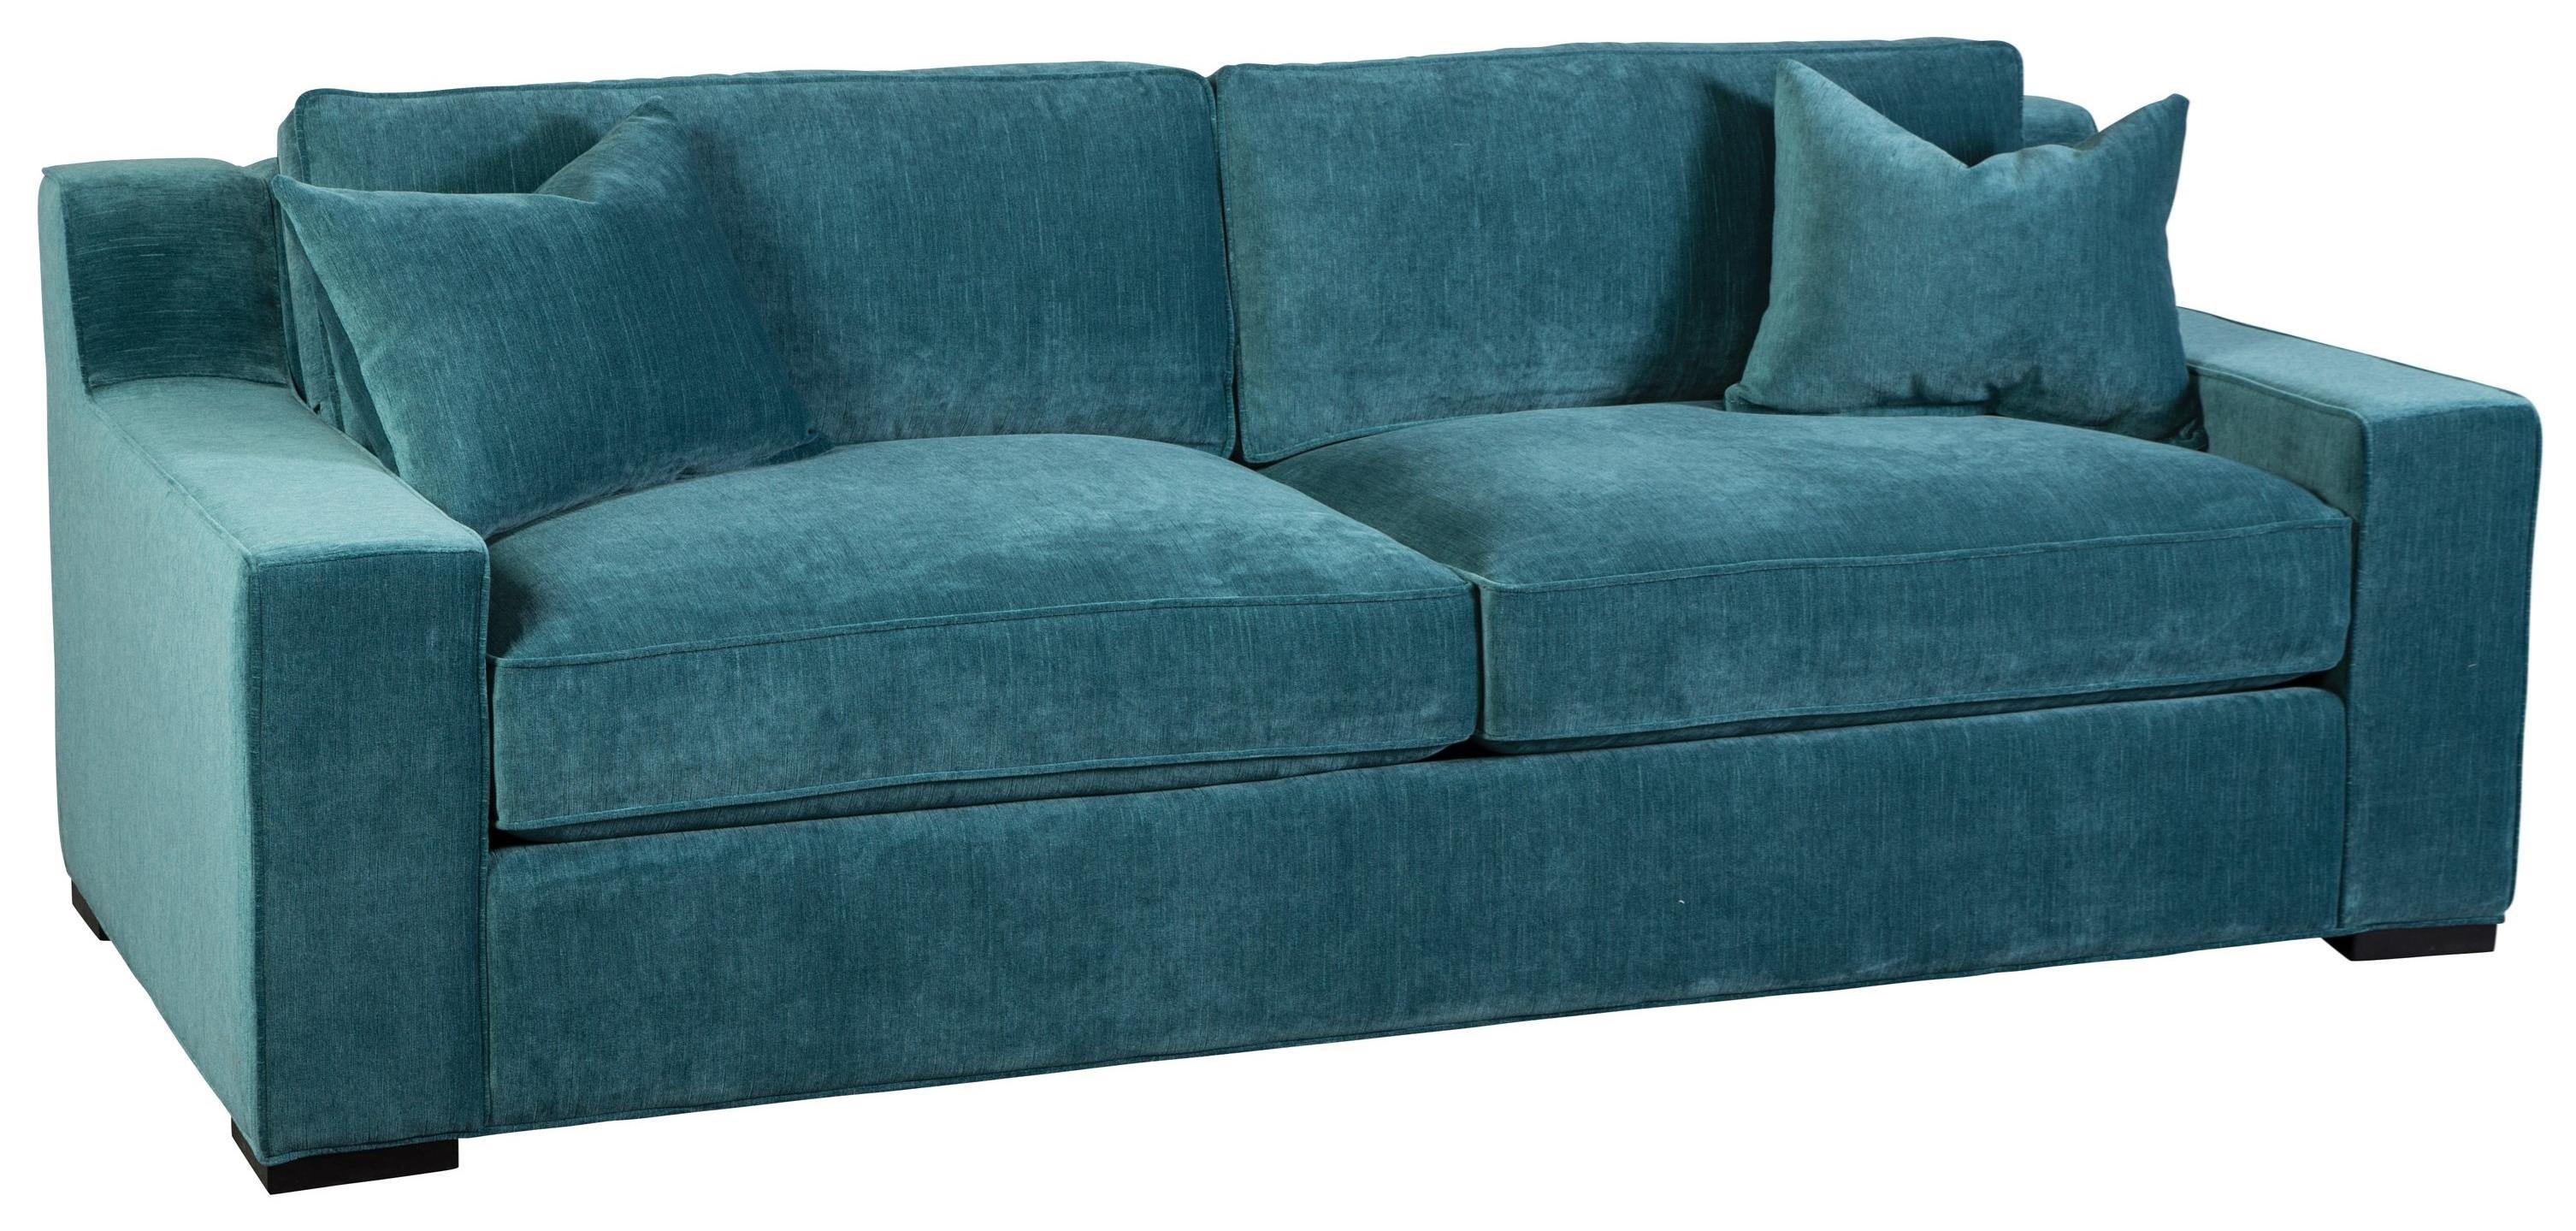 wide sofas sofa cognac laeder morello casual with track arms rotmans